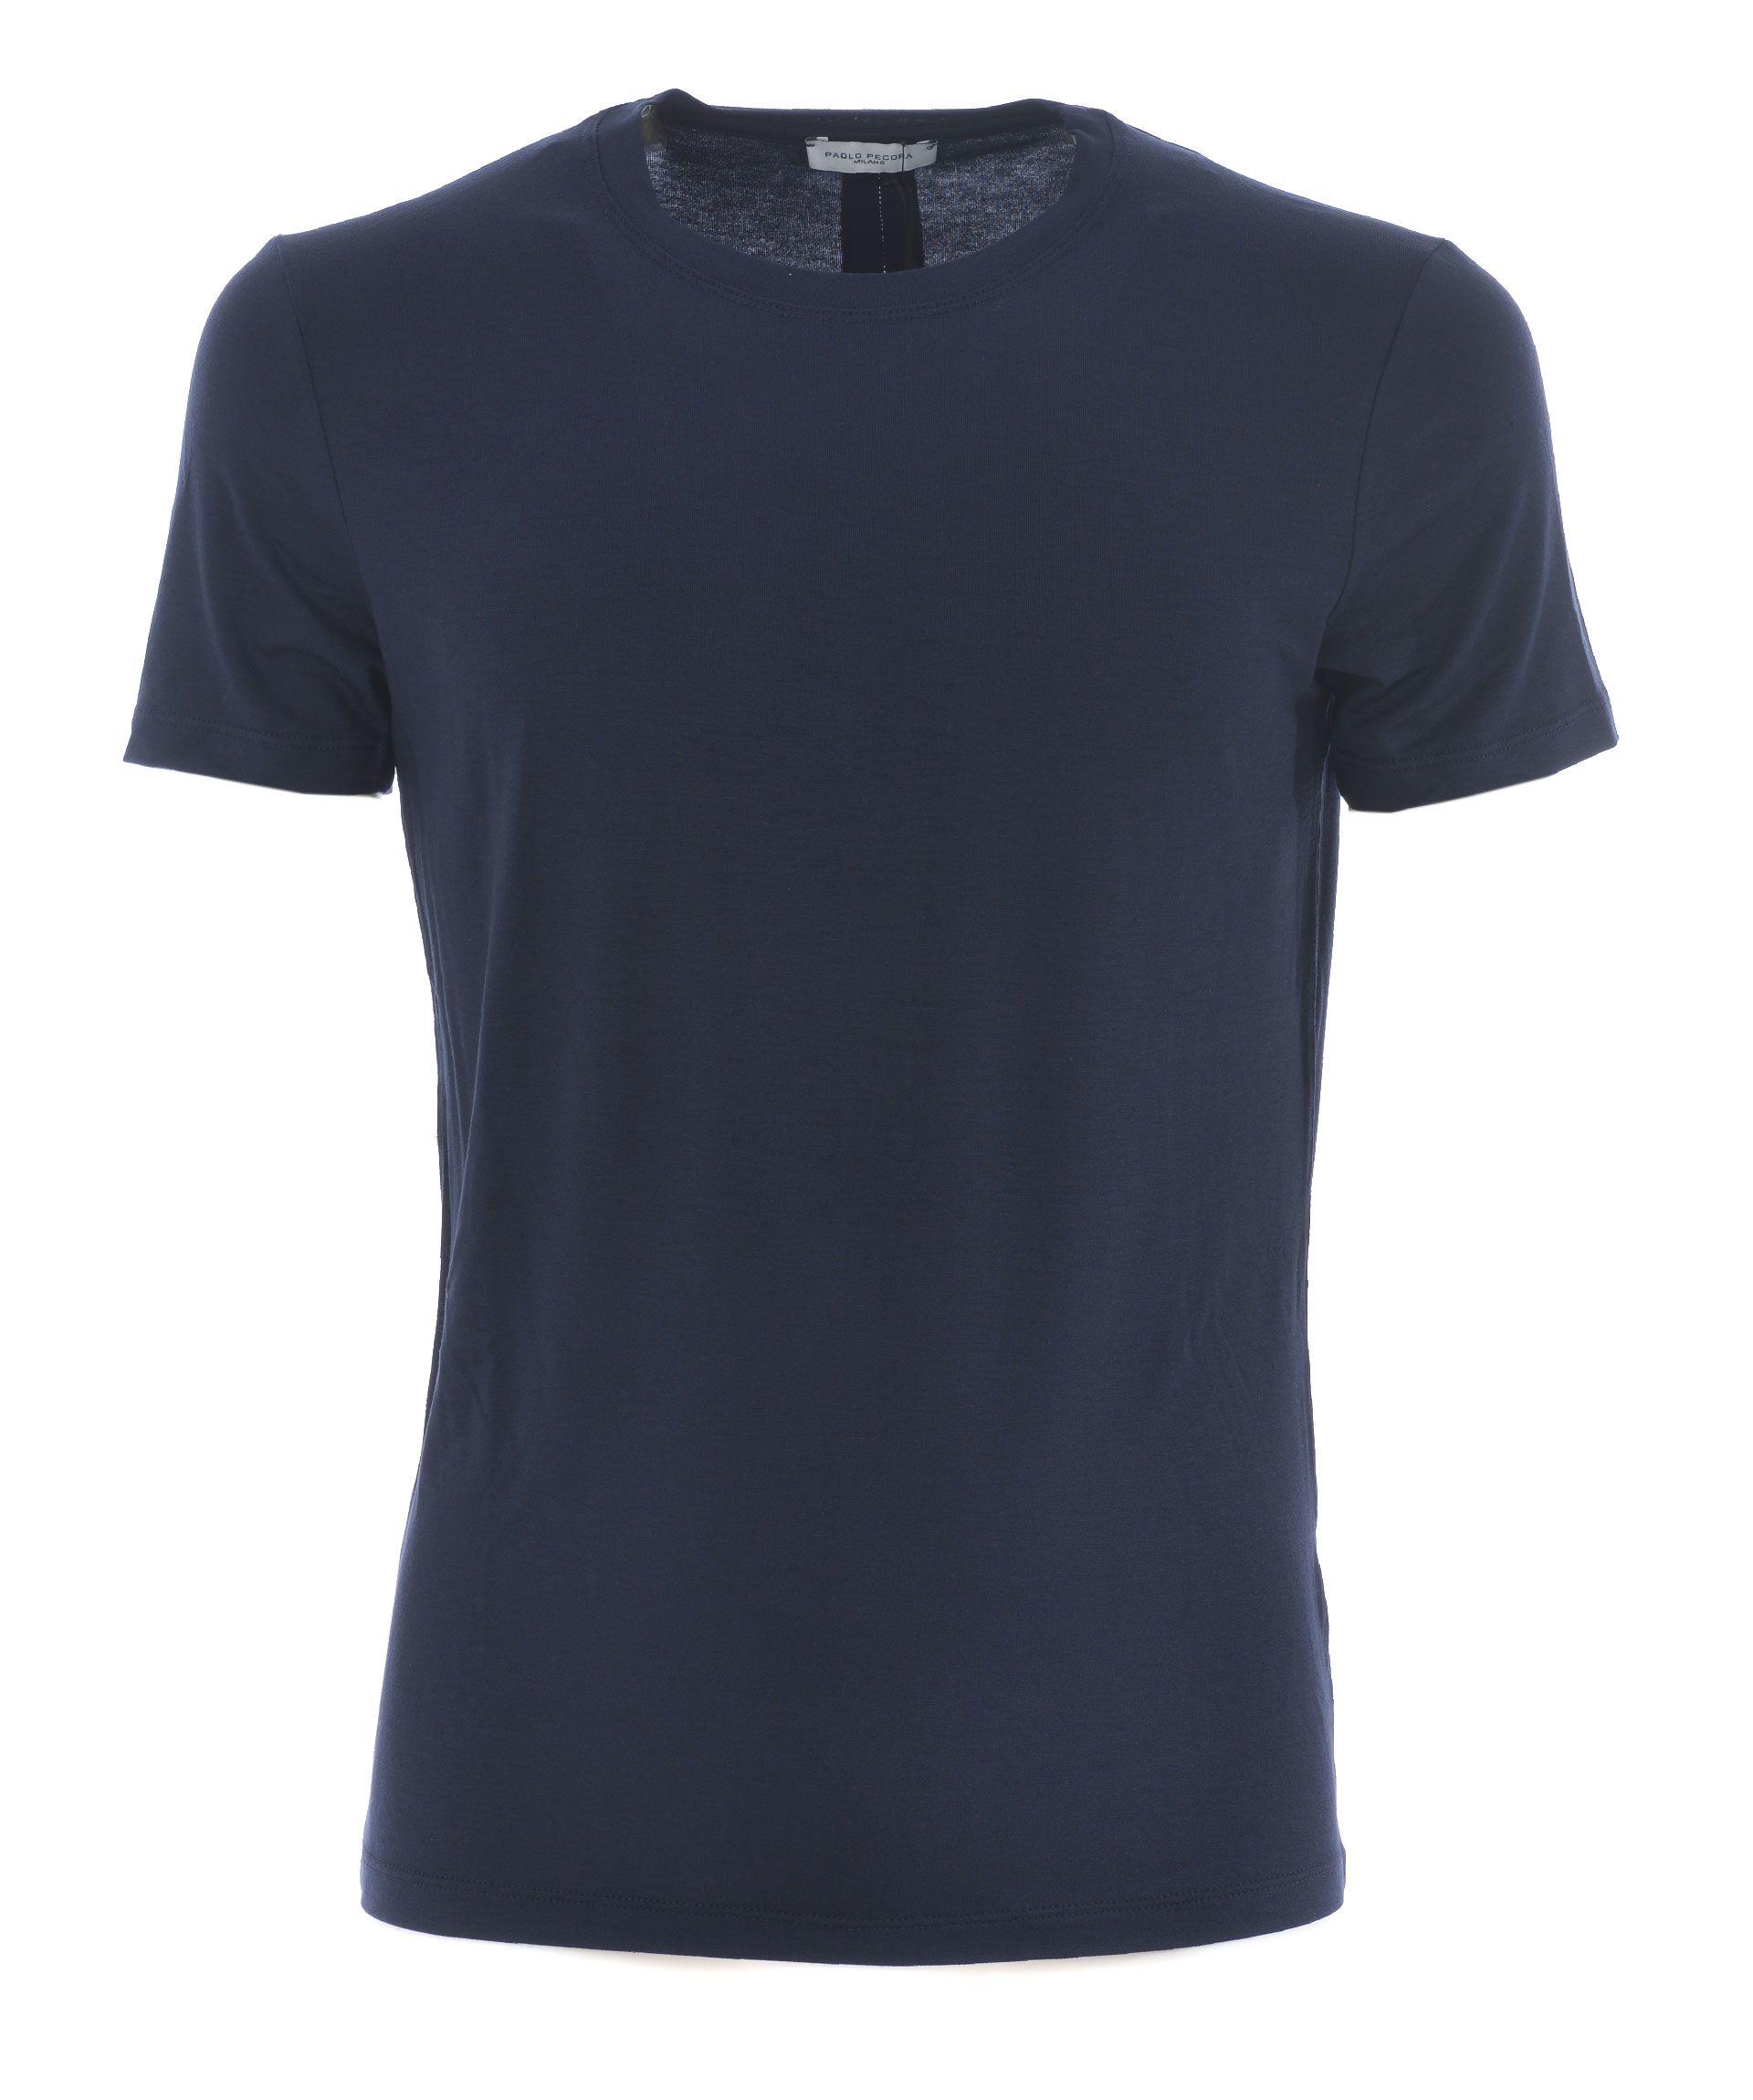 Paolo Pecora Plain T-shirt